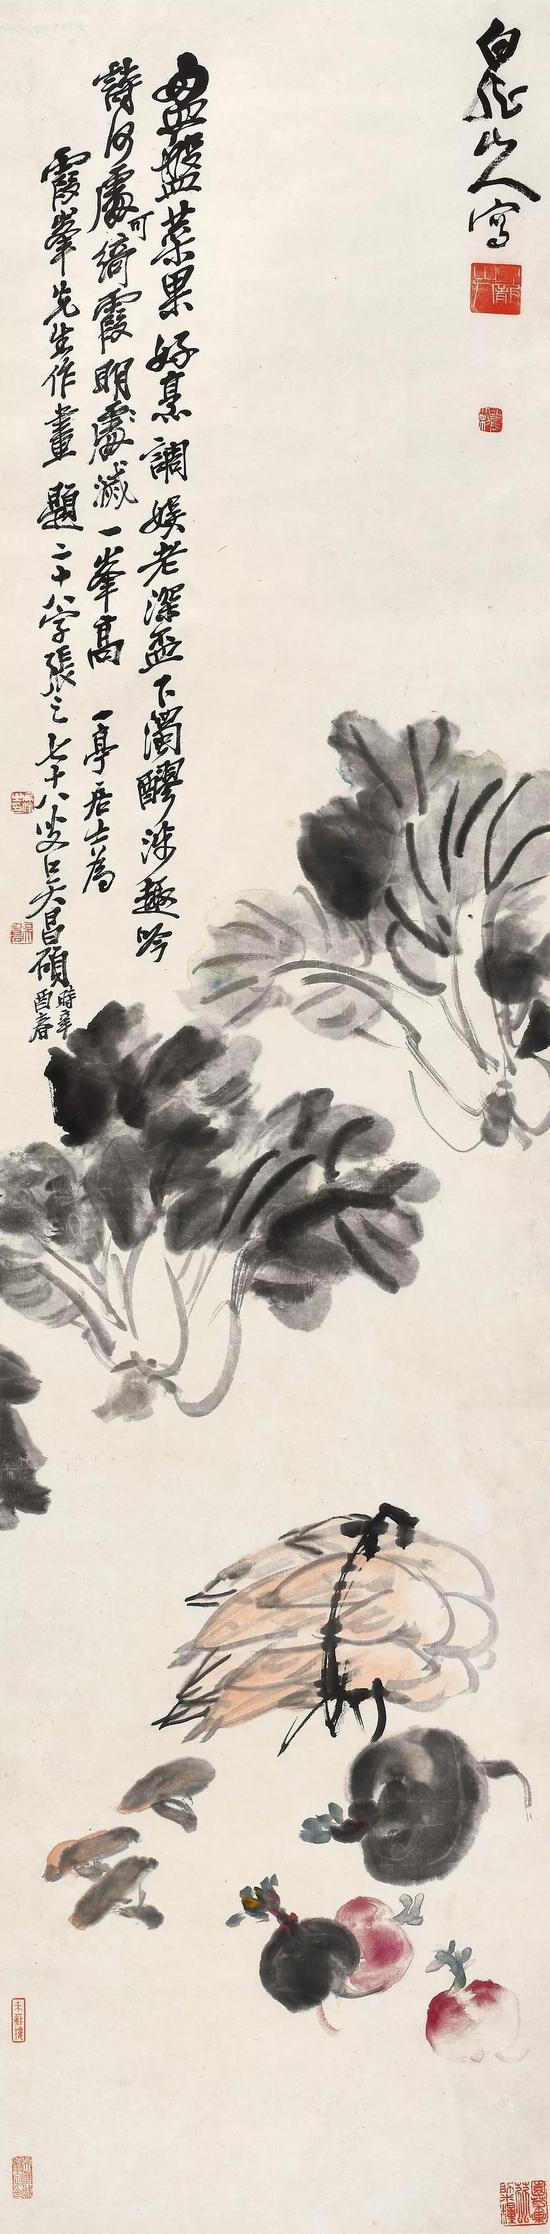 Lot 363 王震(1867-1938)清蔬伴吟趣